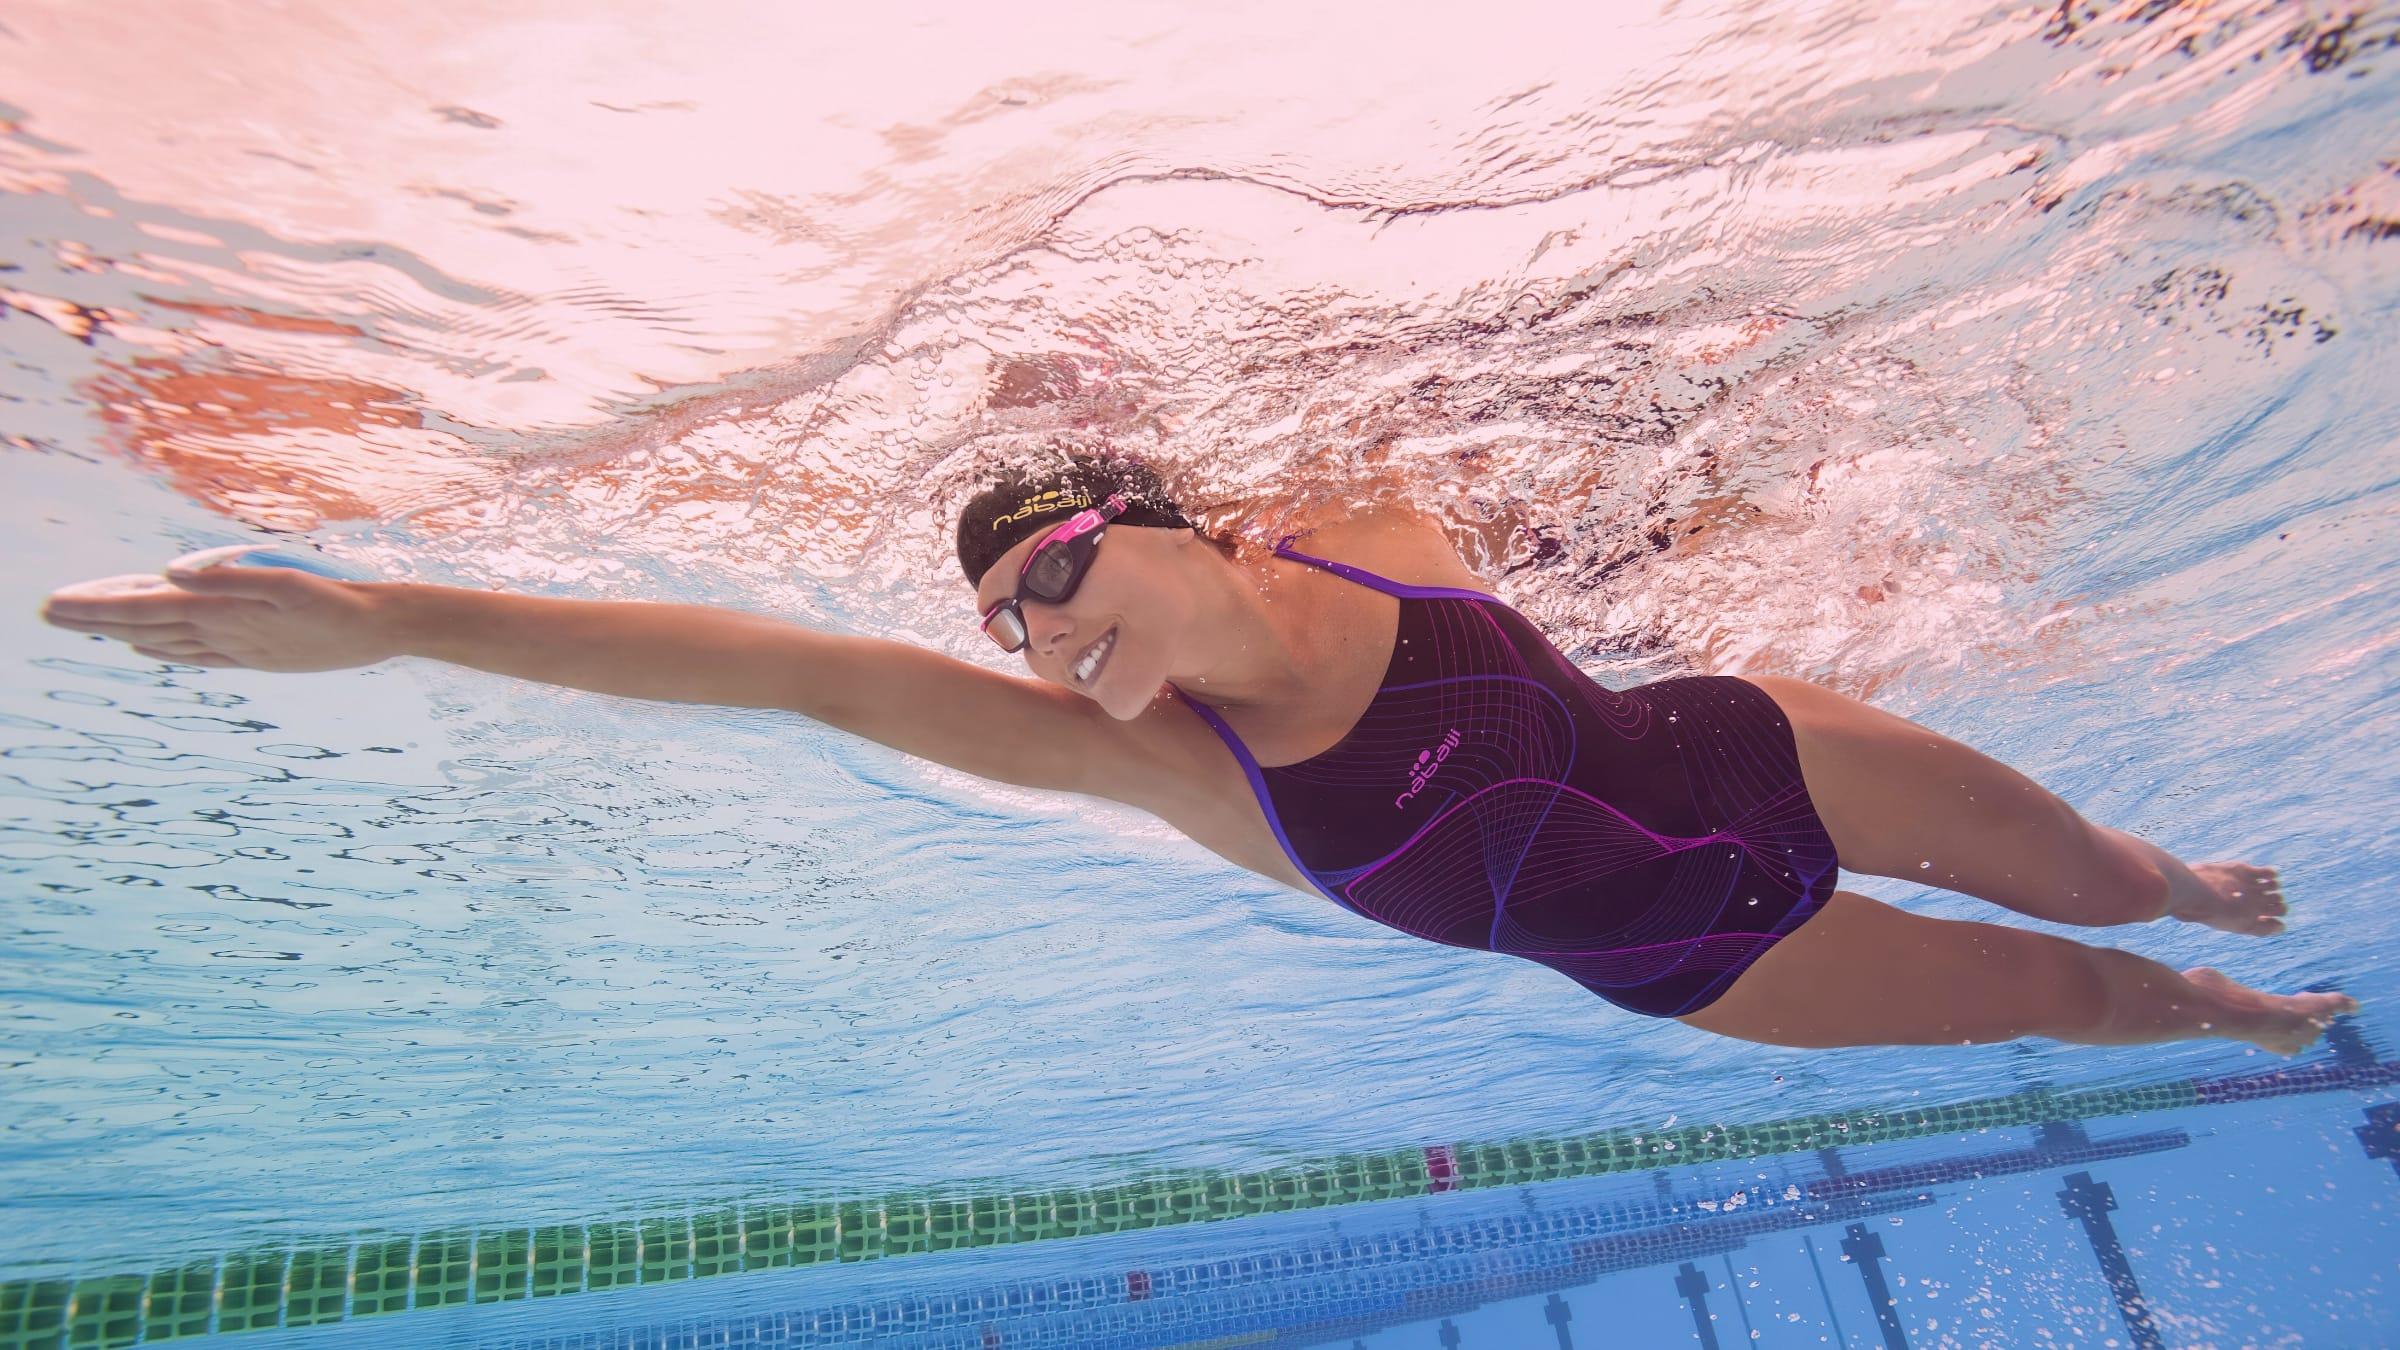 Пловчиха под водой